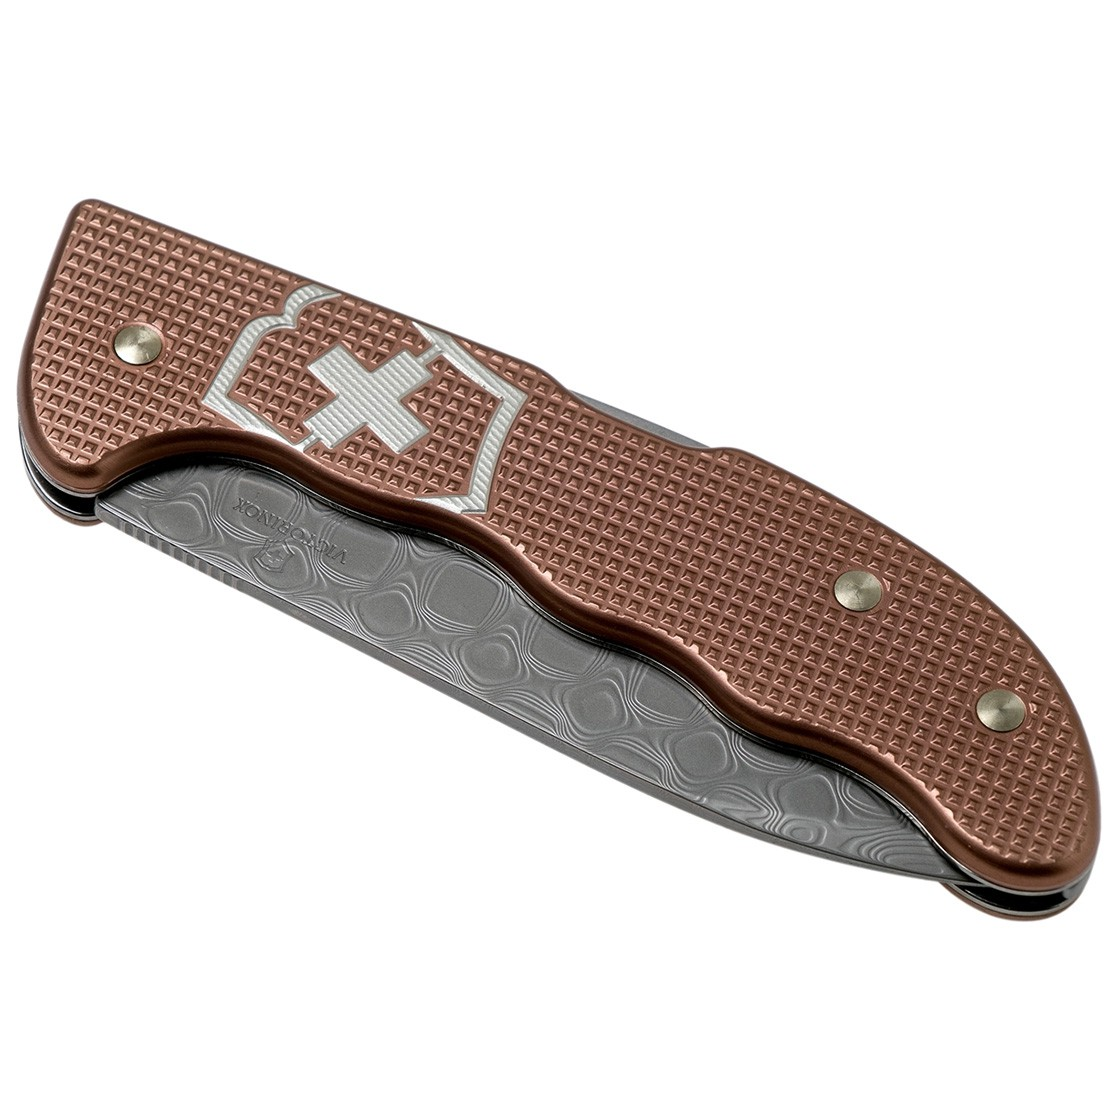 Canivete Victorinox Hunter Pro Alox Damasco Edição Limitada 2020  0.9410.J20